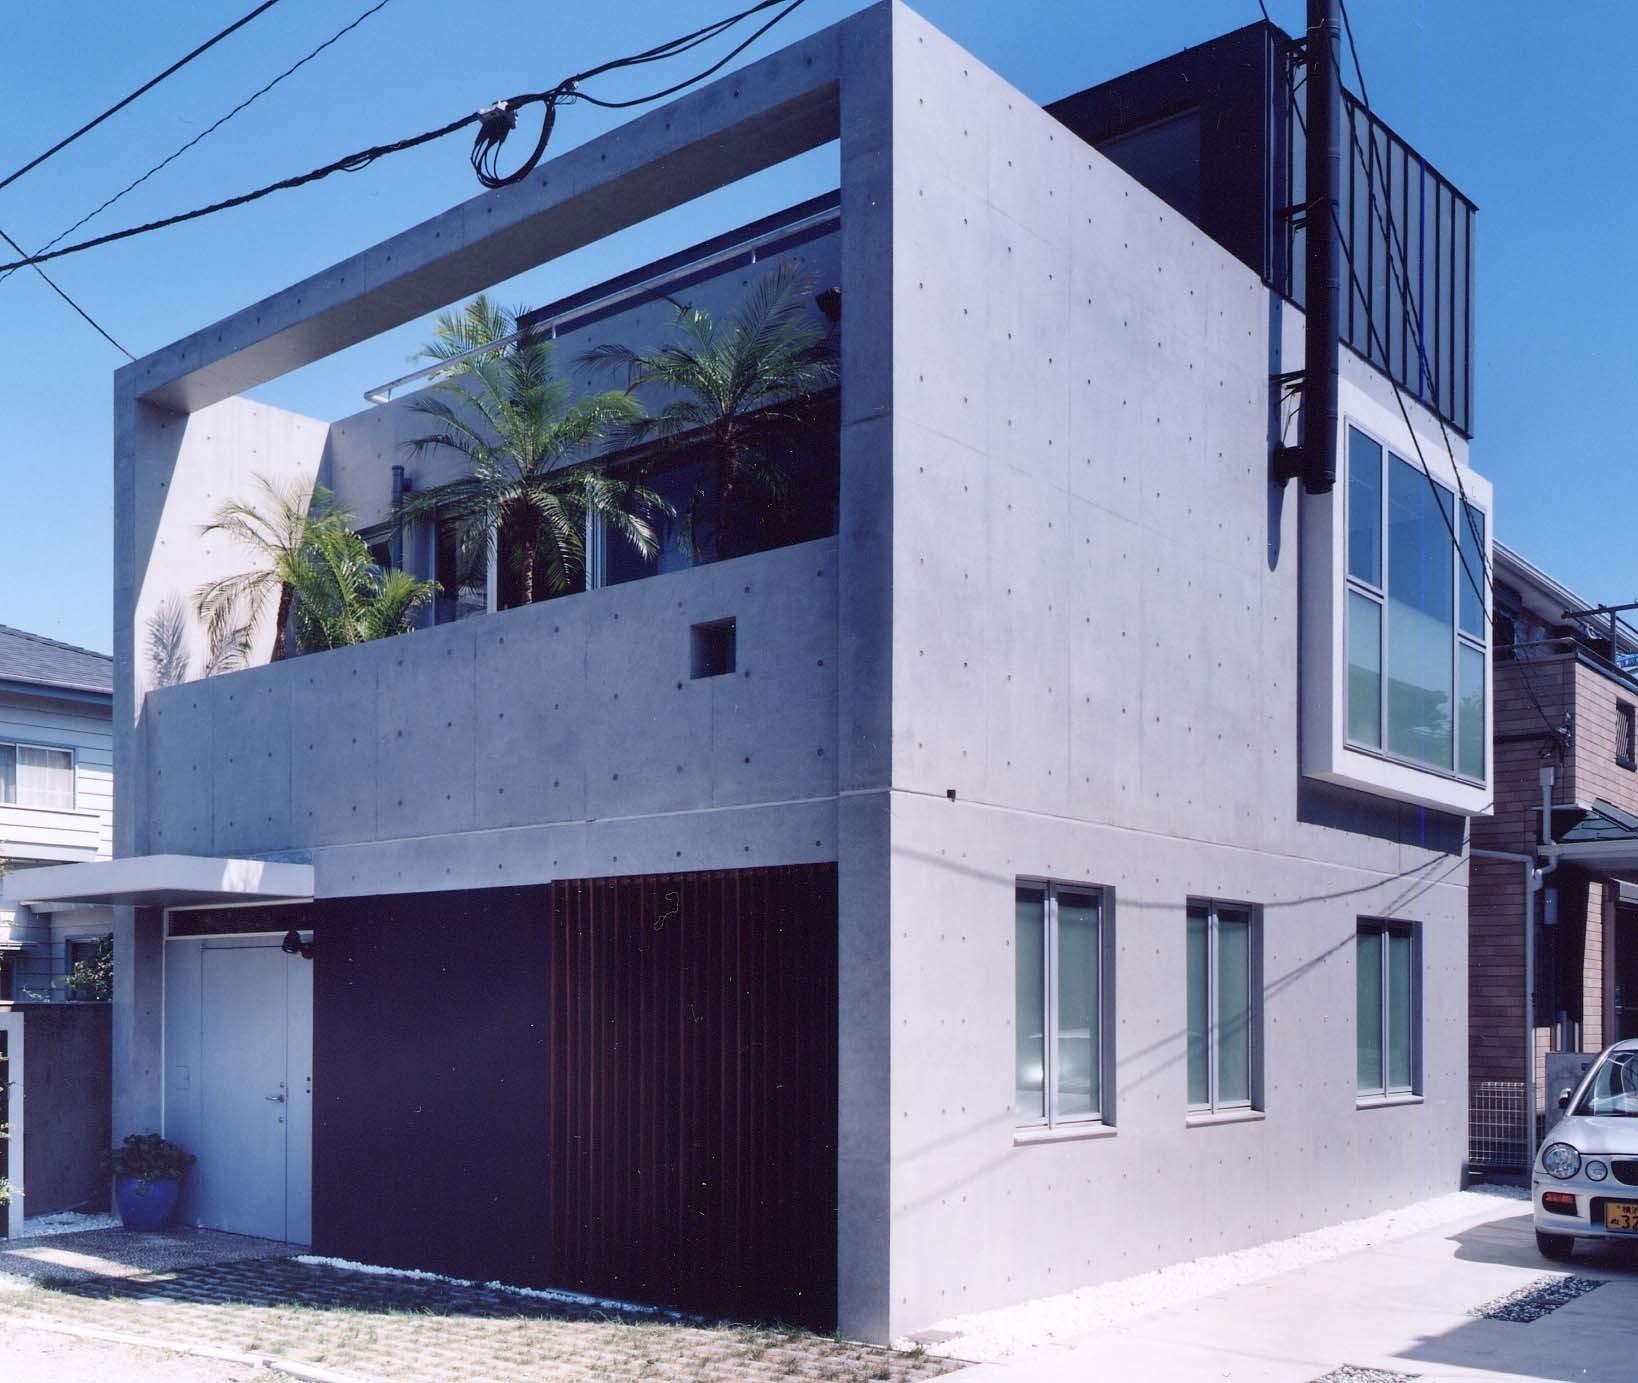 RC造∔木造(混構造)、薪ストーブの家 | | SuMiKa | 建築家・工務店と ...